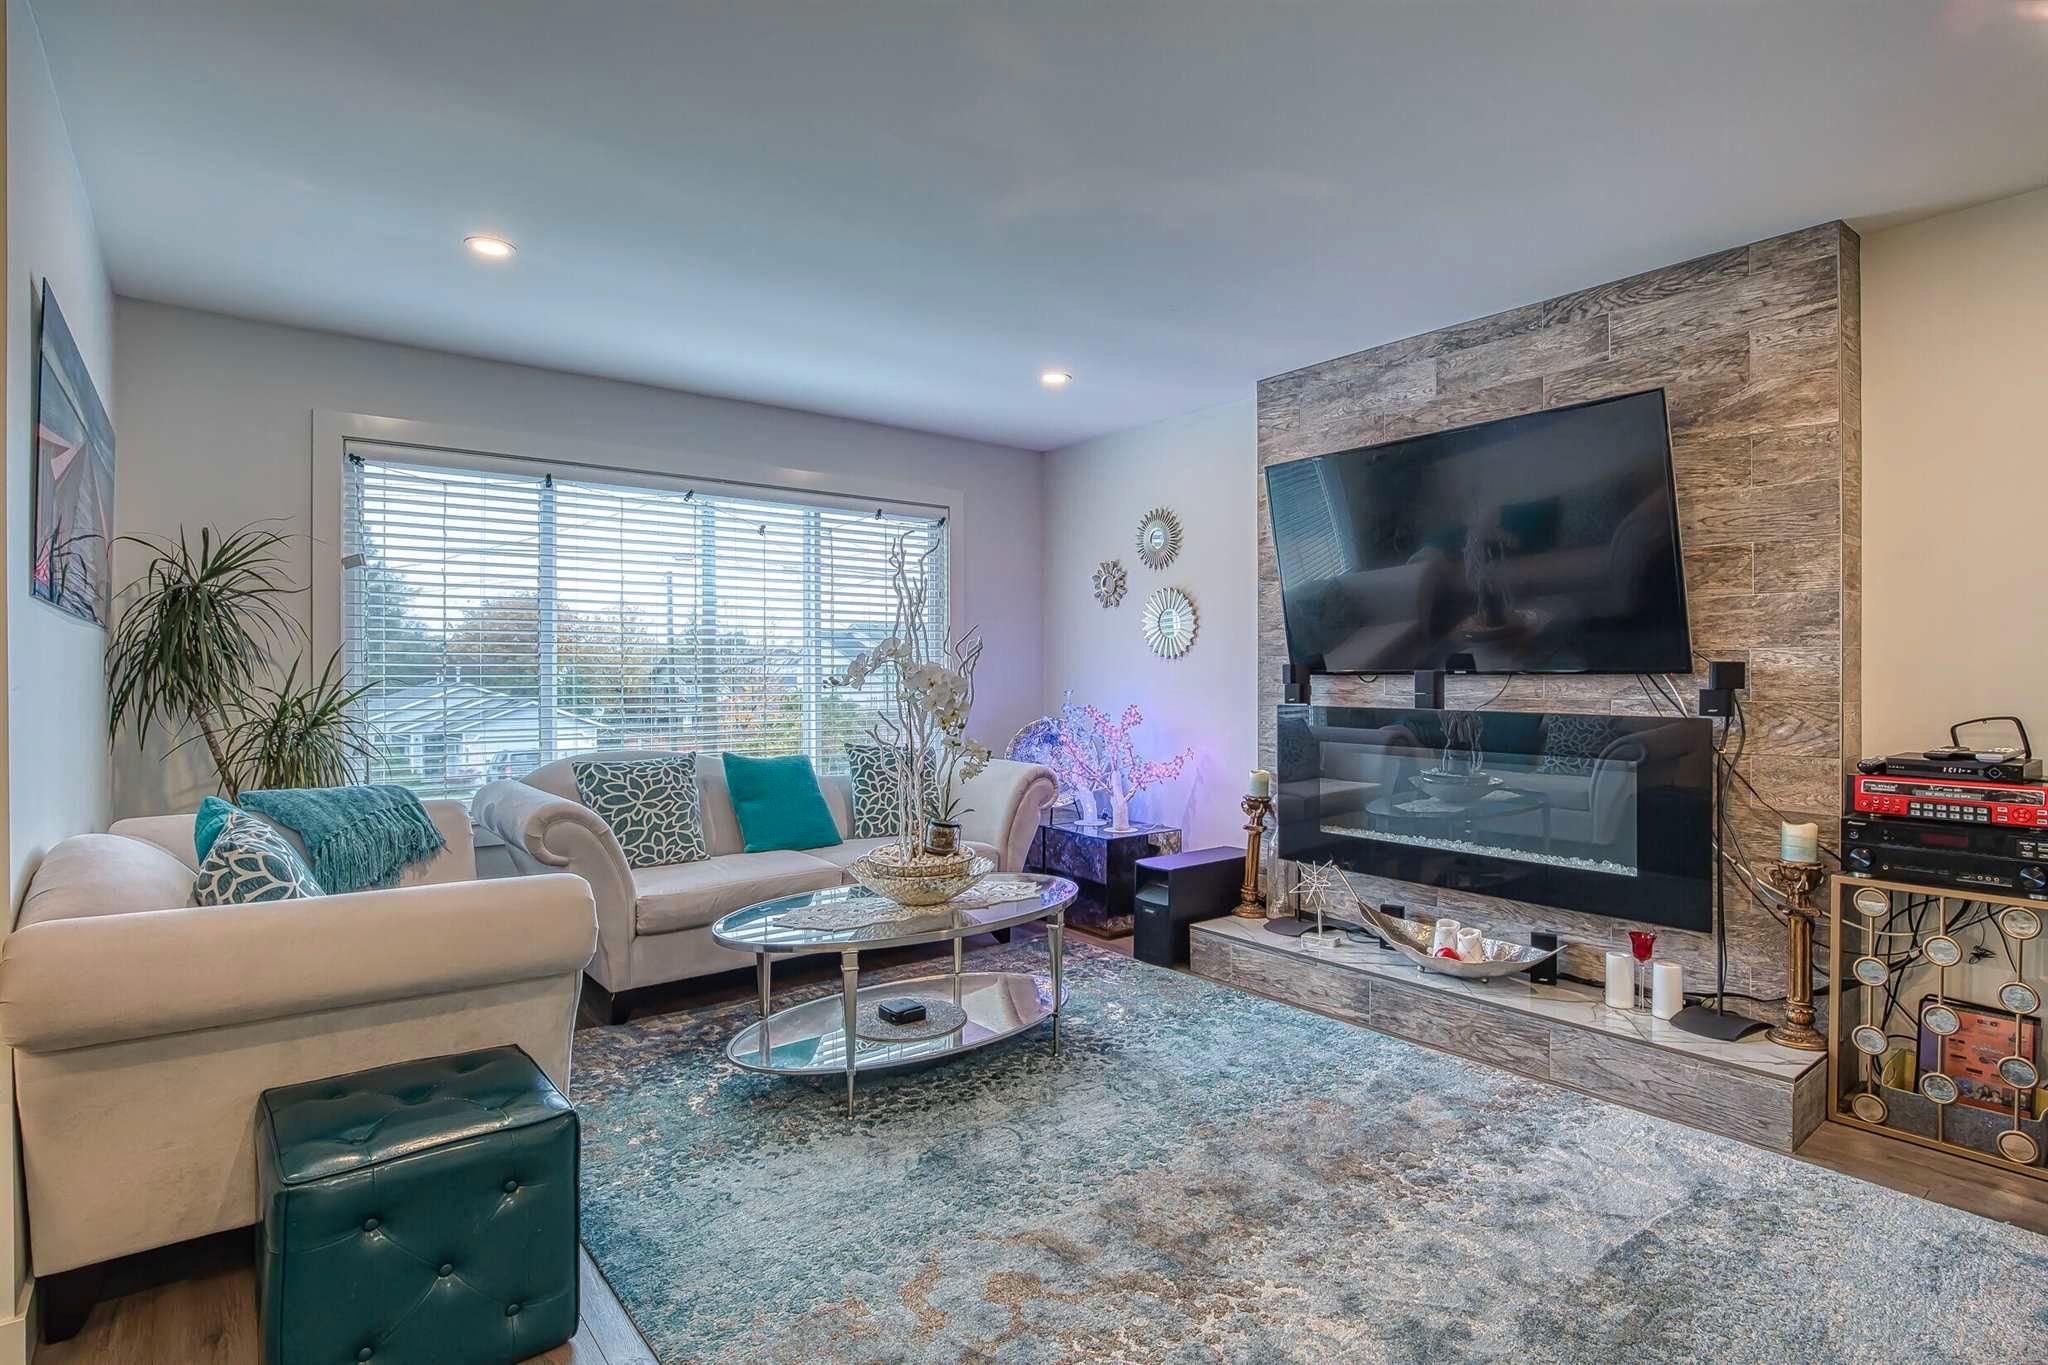 Main Photo: 11672 203 Street in Maple Ridge: Southwest Maple Ridge House for sale : MLS®# R2607010